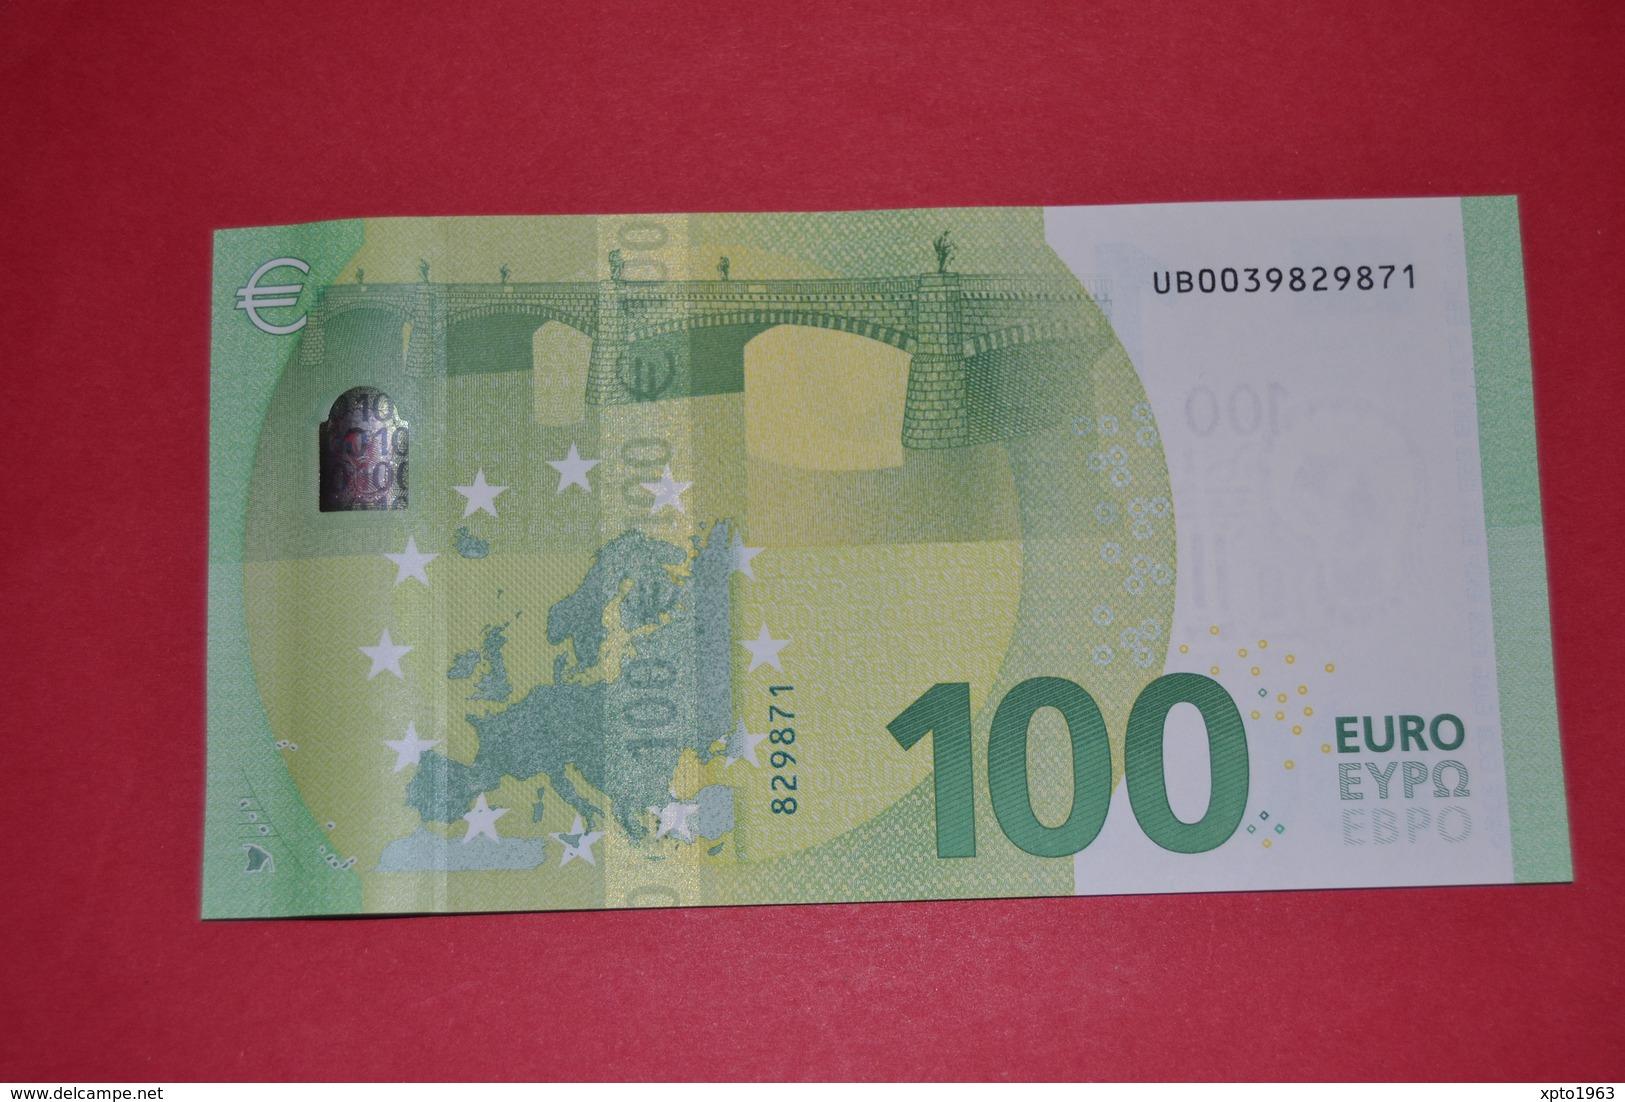 FRANCE 100 EURO - U002C2 Série Europa - Serial Number: UB0039829871 - UNC NEUF - EURO